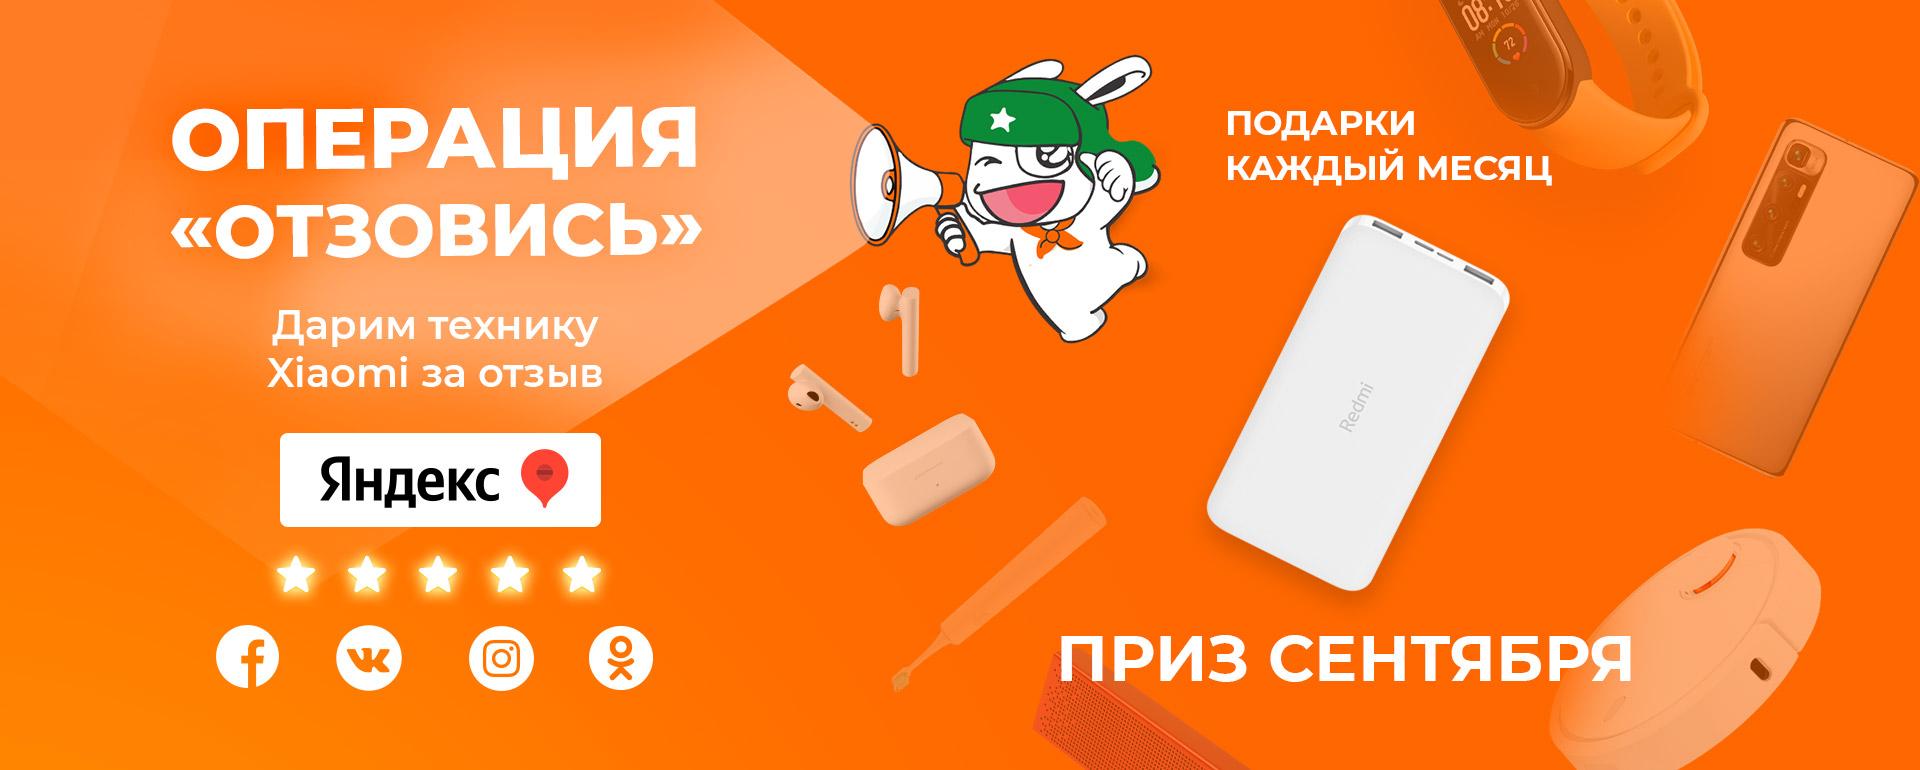 Акция Отзовись - Сентябрь